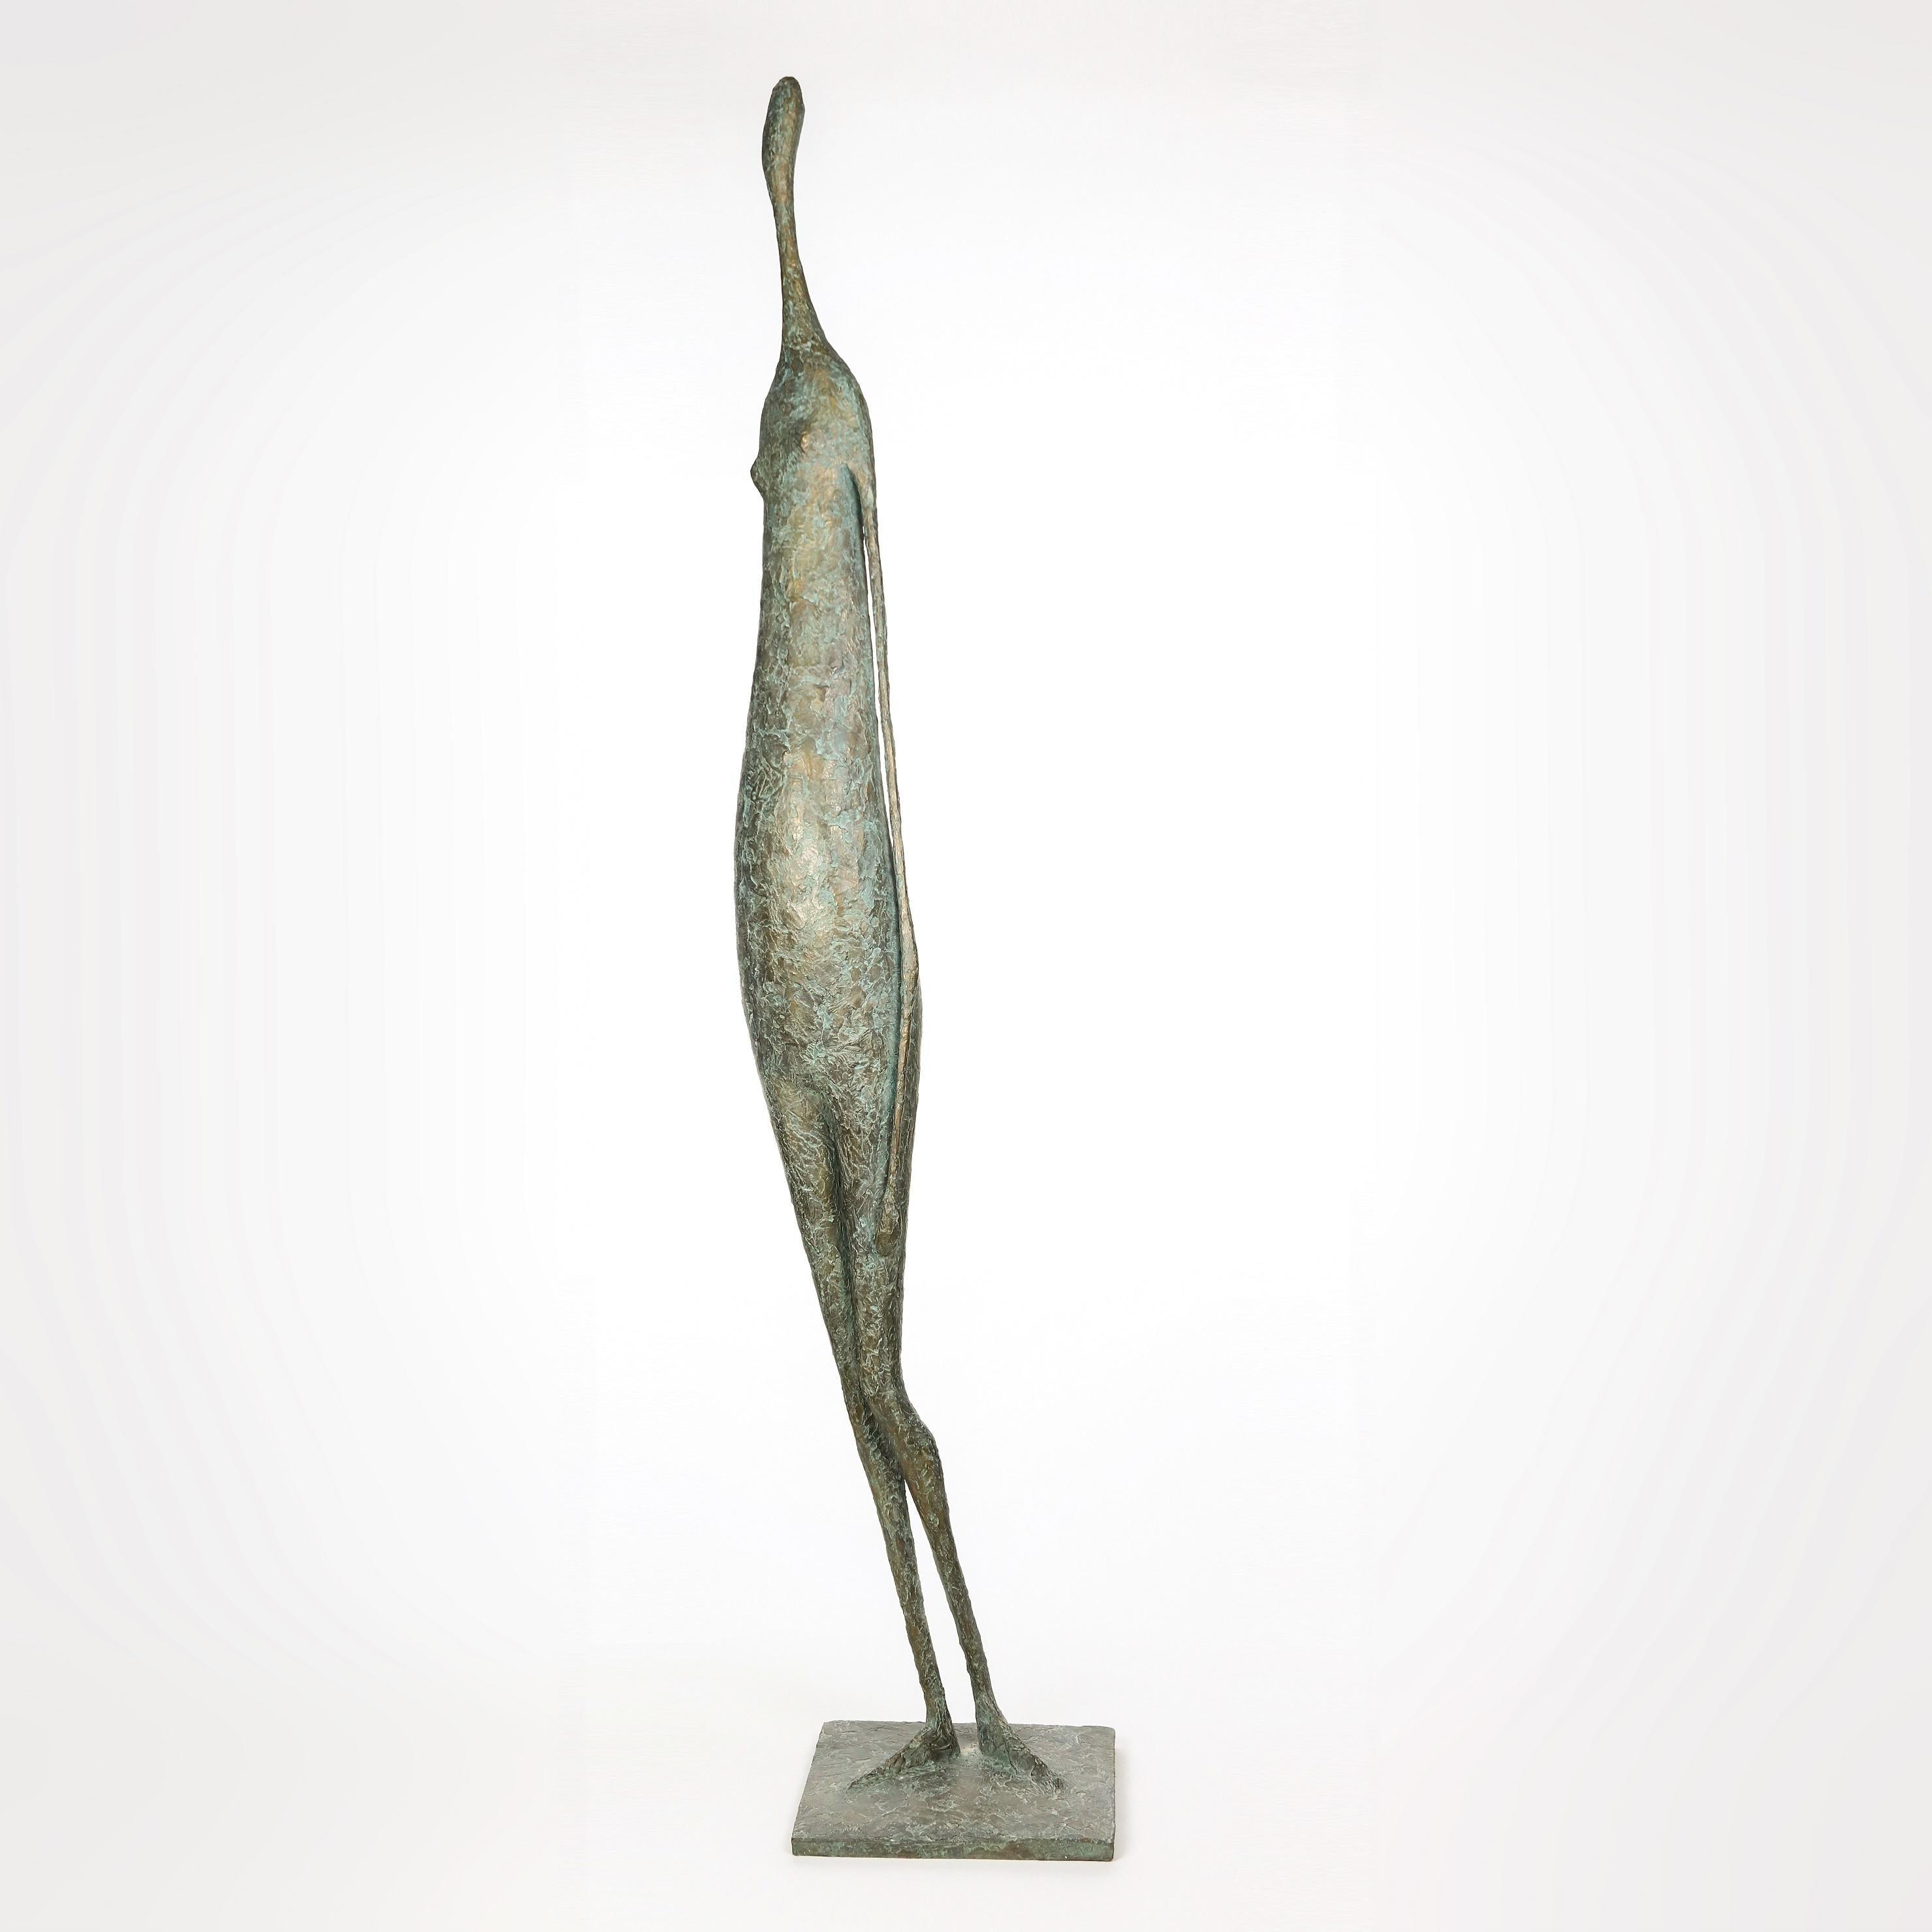 Large Standing Figure VI (contemporary bronze sculpture)